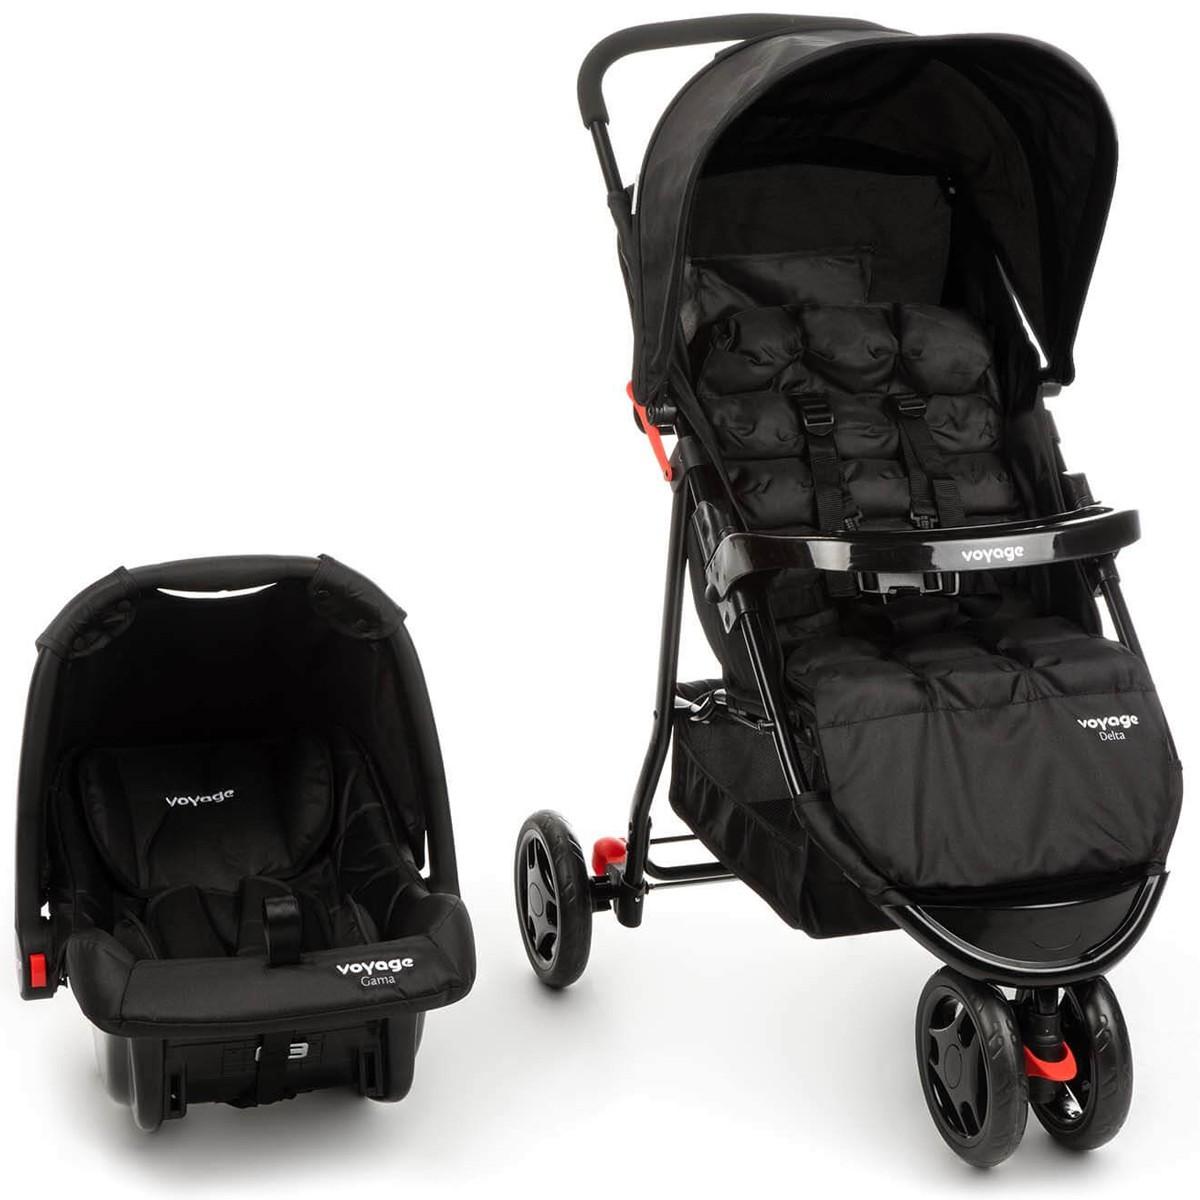 Kit Carrinho de Bebê Delta + Bebê Conforto Gama Preto Travel System - Voyage